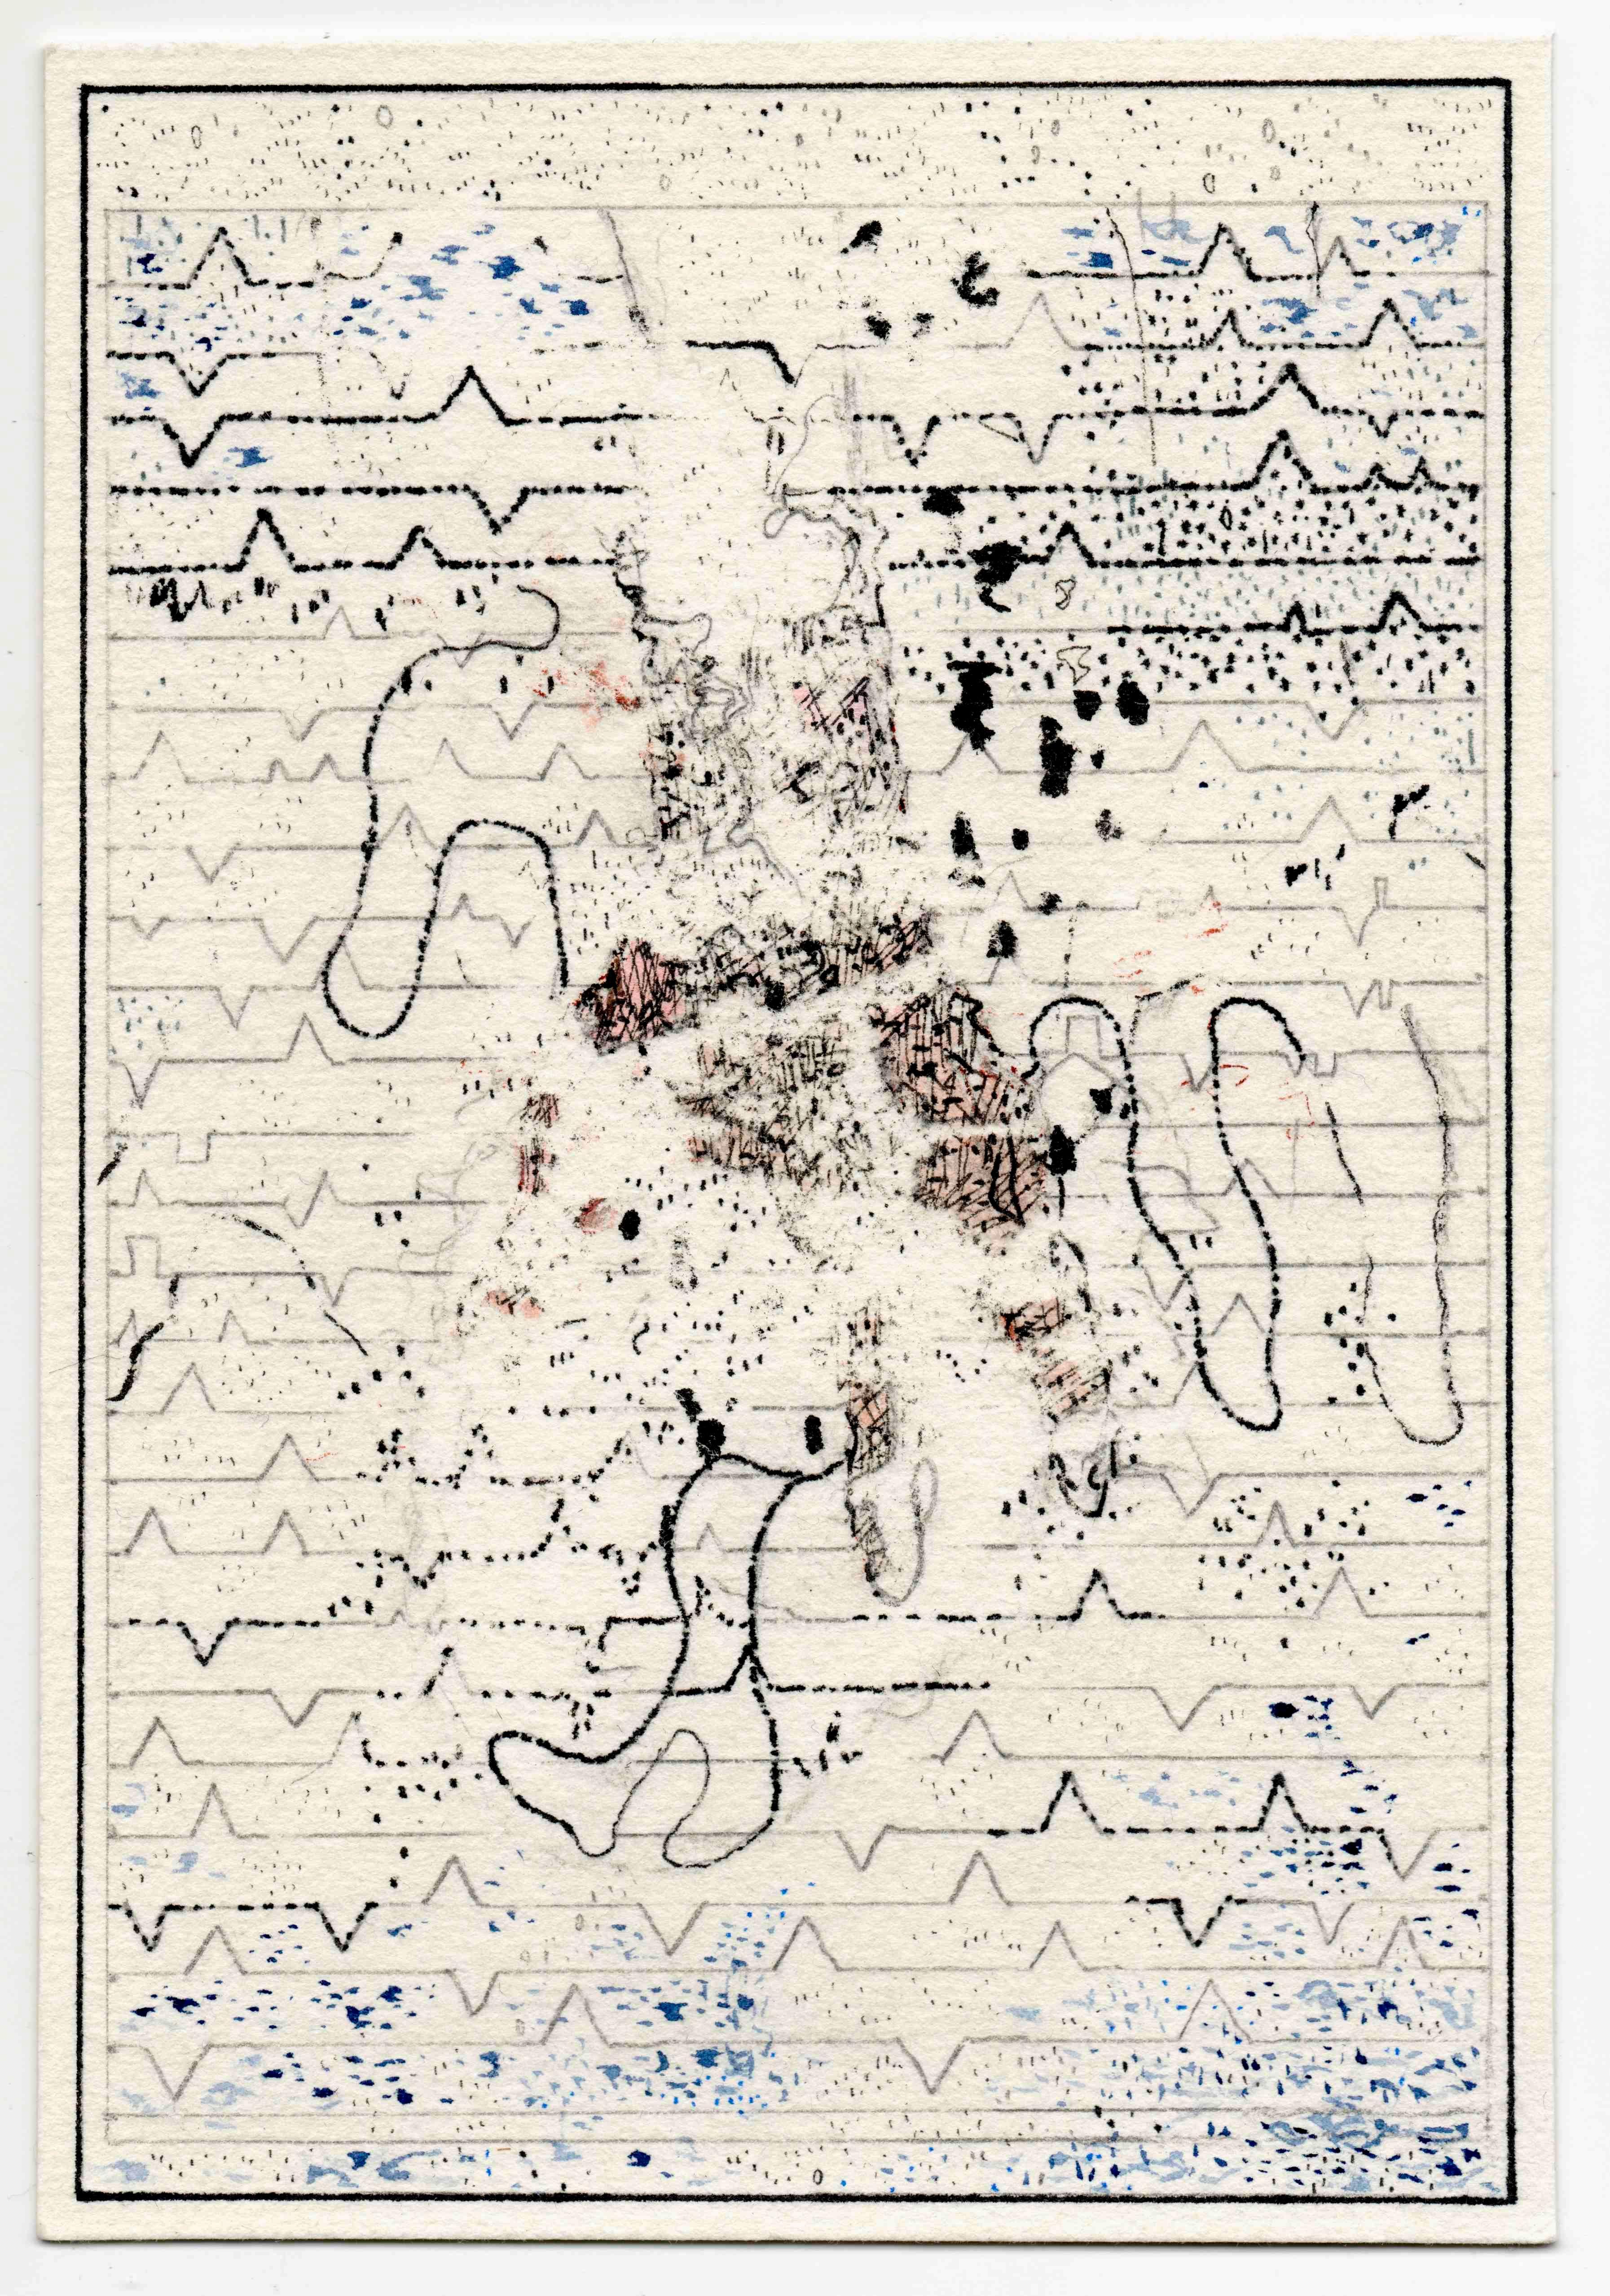 Clear Hands Tinta y lápiz sobre papel | 5.6 x 12.1 cm | 2016